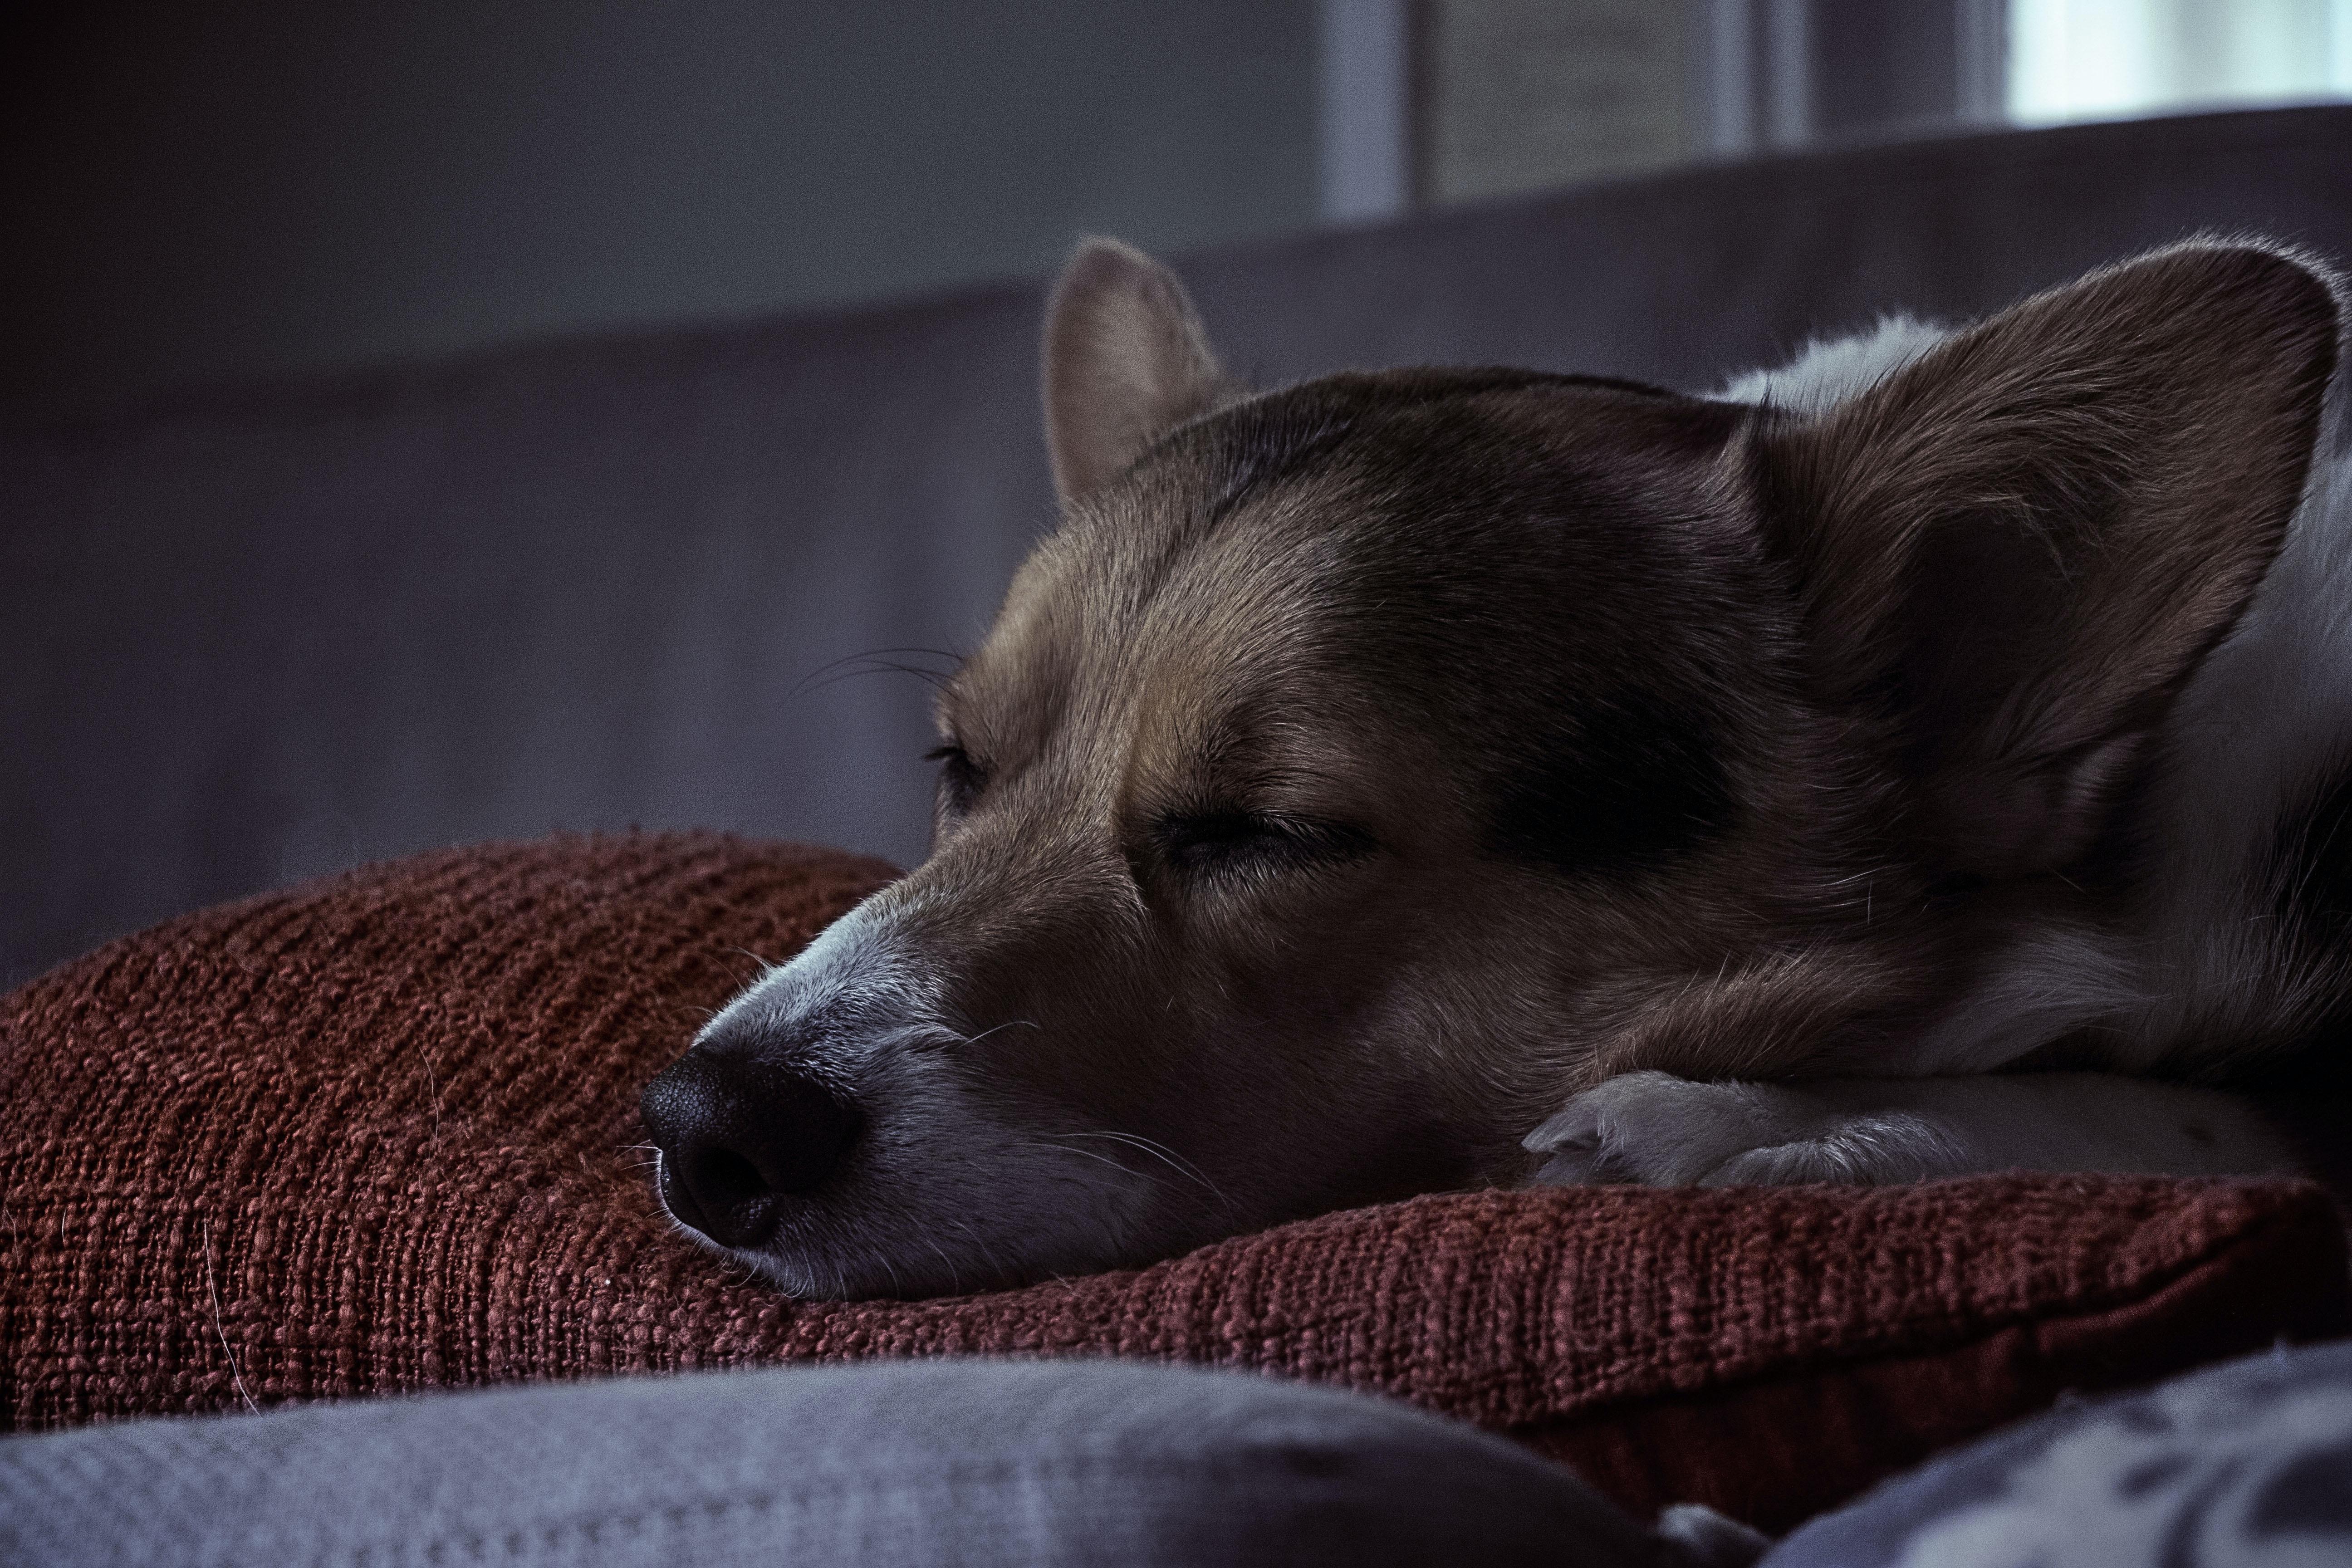 A corgi sleeping on a soft pillow